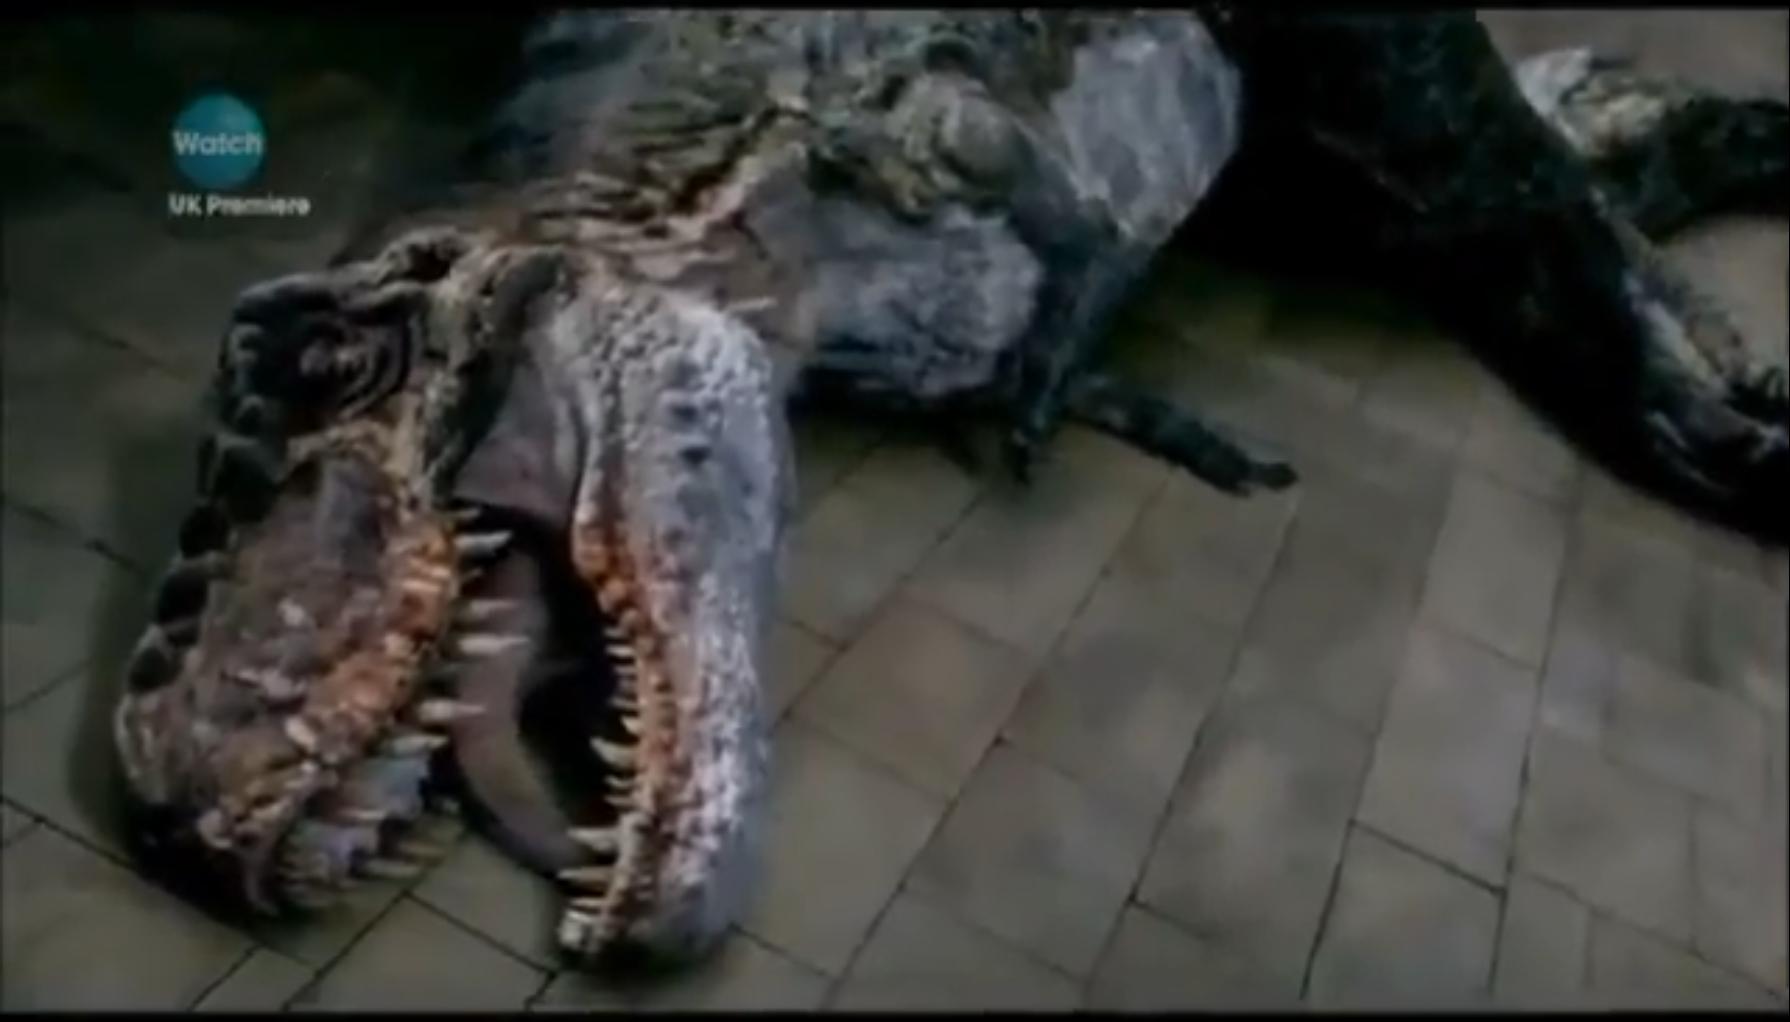 Tyrannosaurus rex | Walking with Dinosaurs Wiki | FANDOM ...